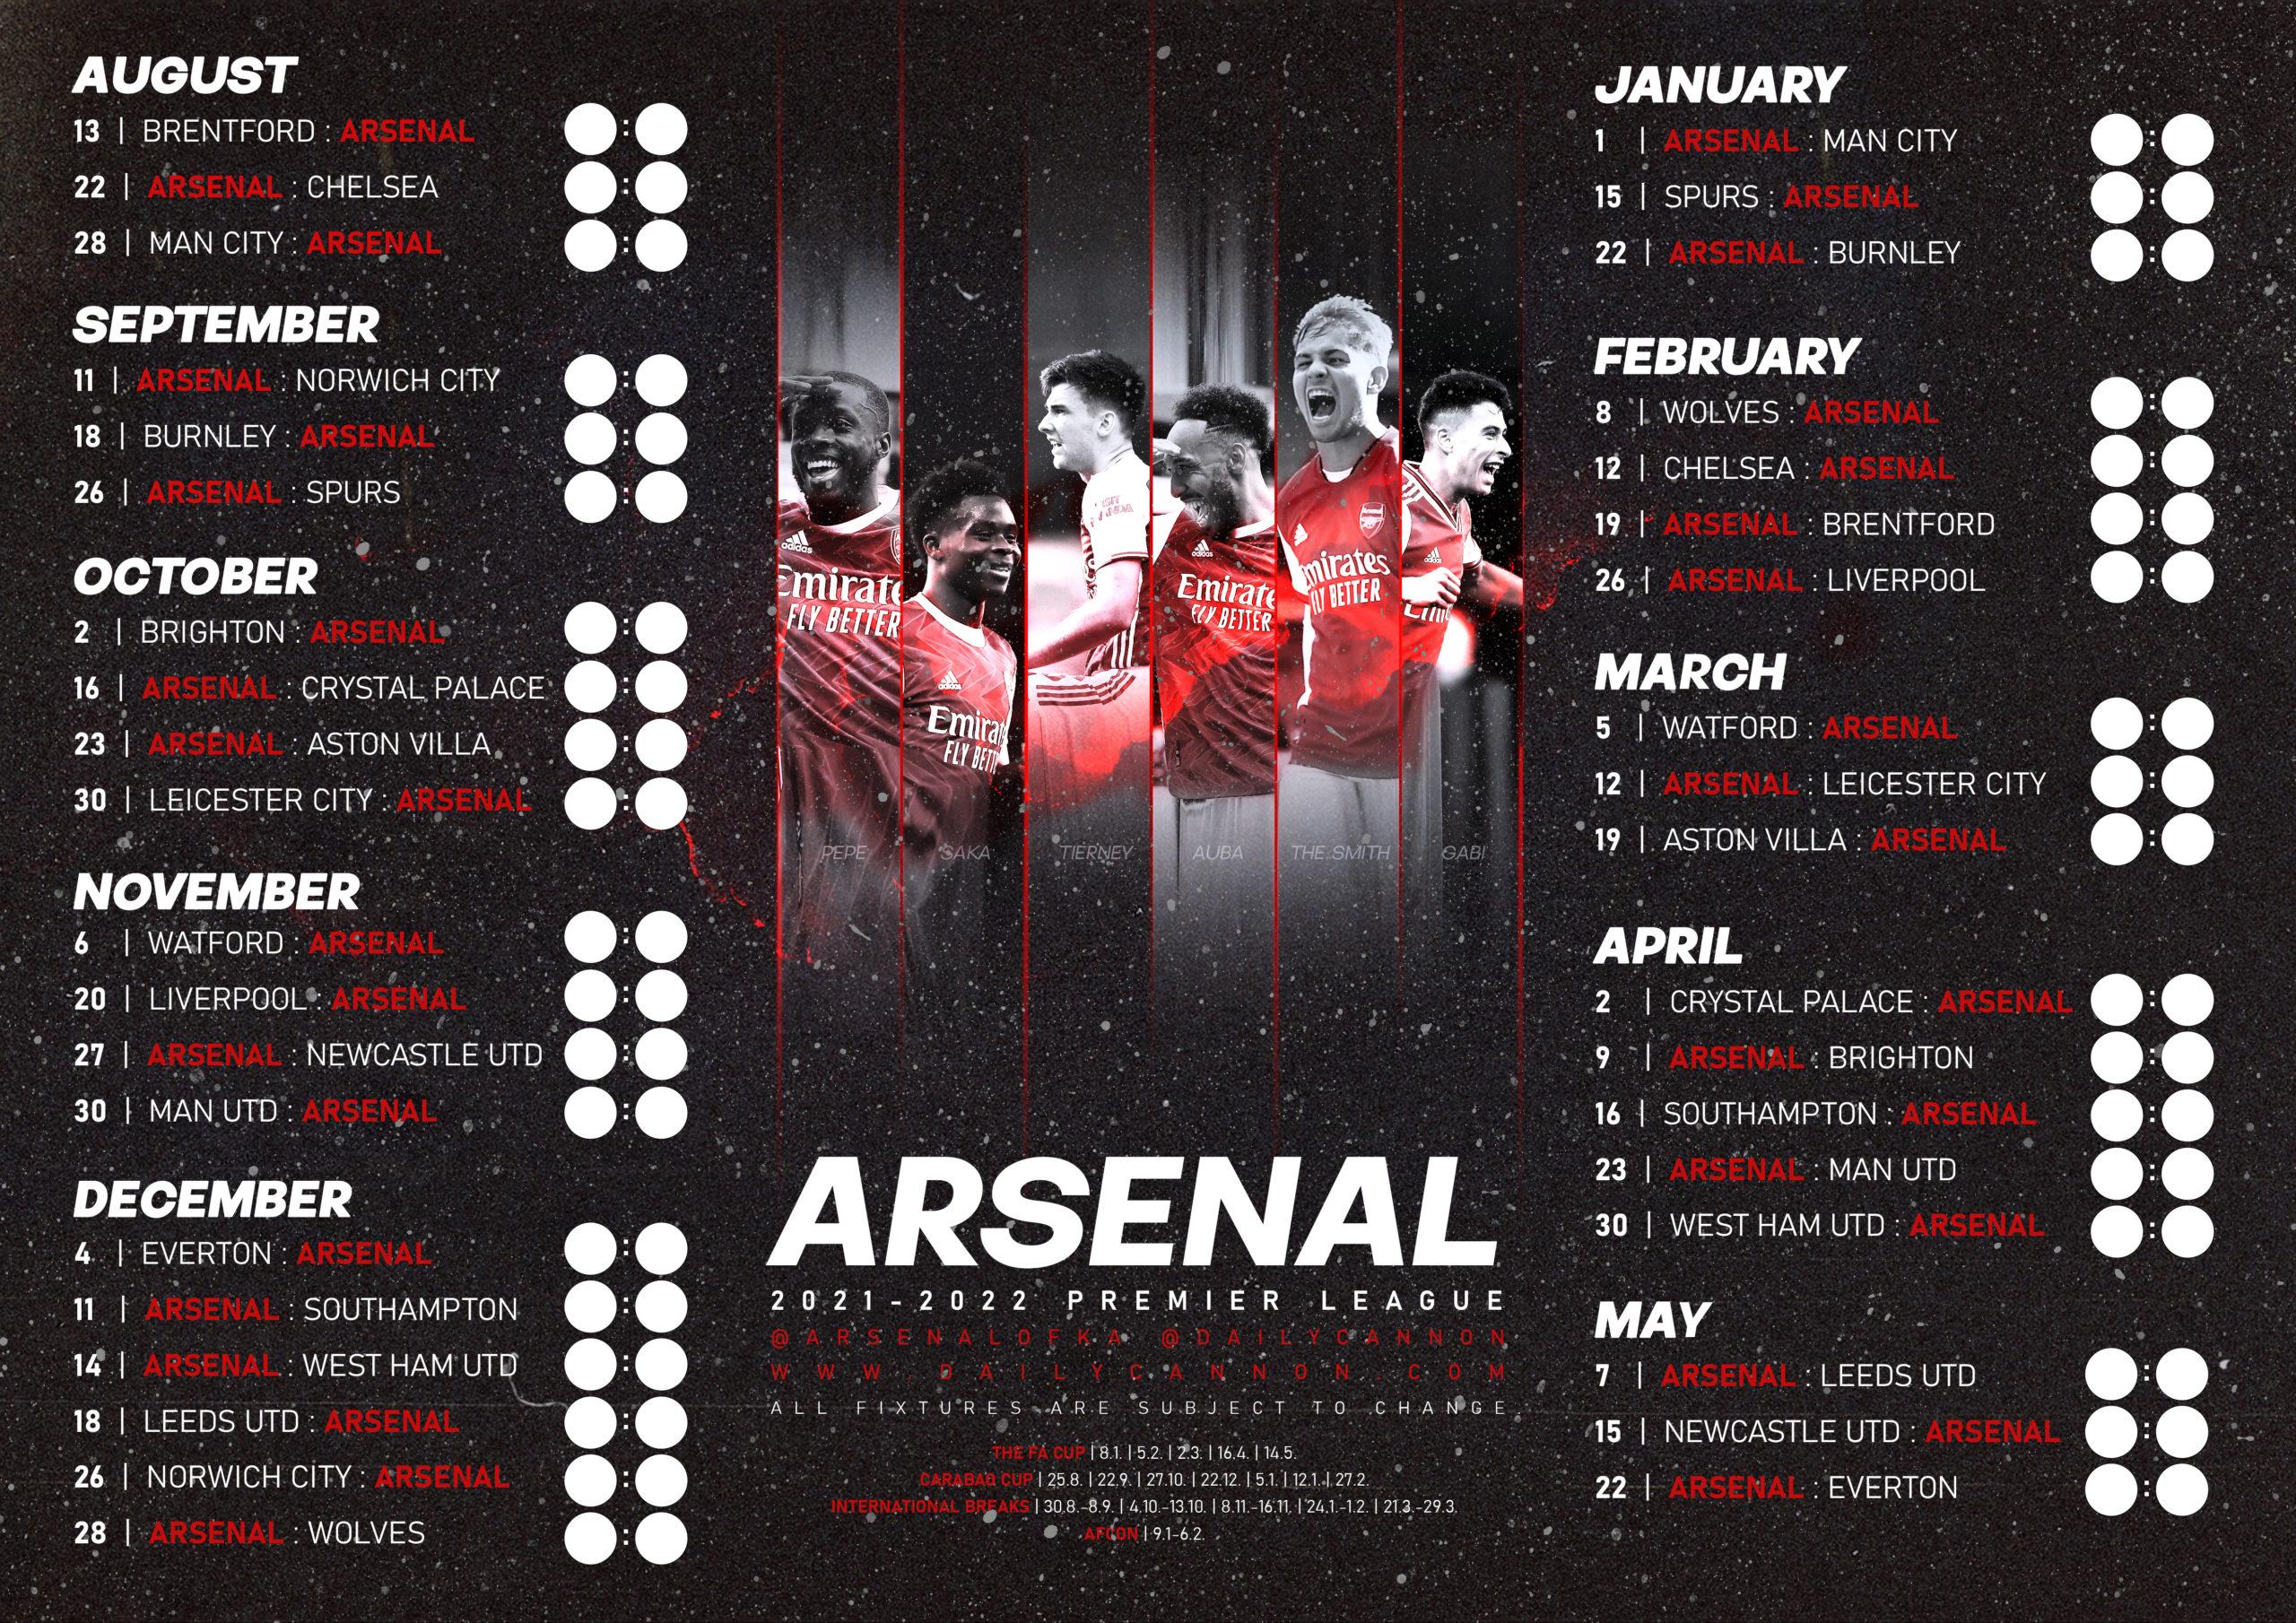 Arsenal prinatbels